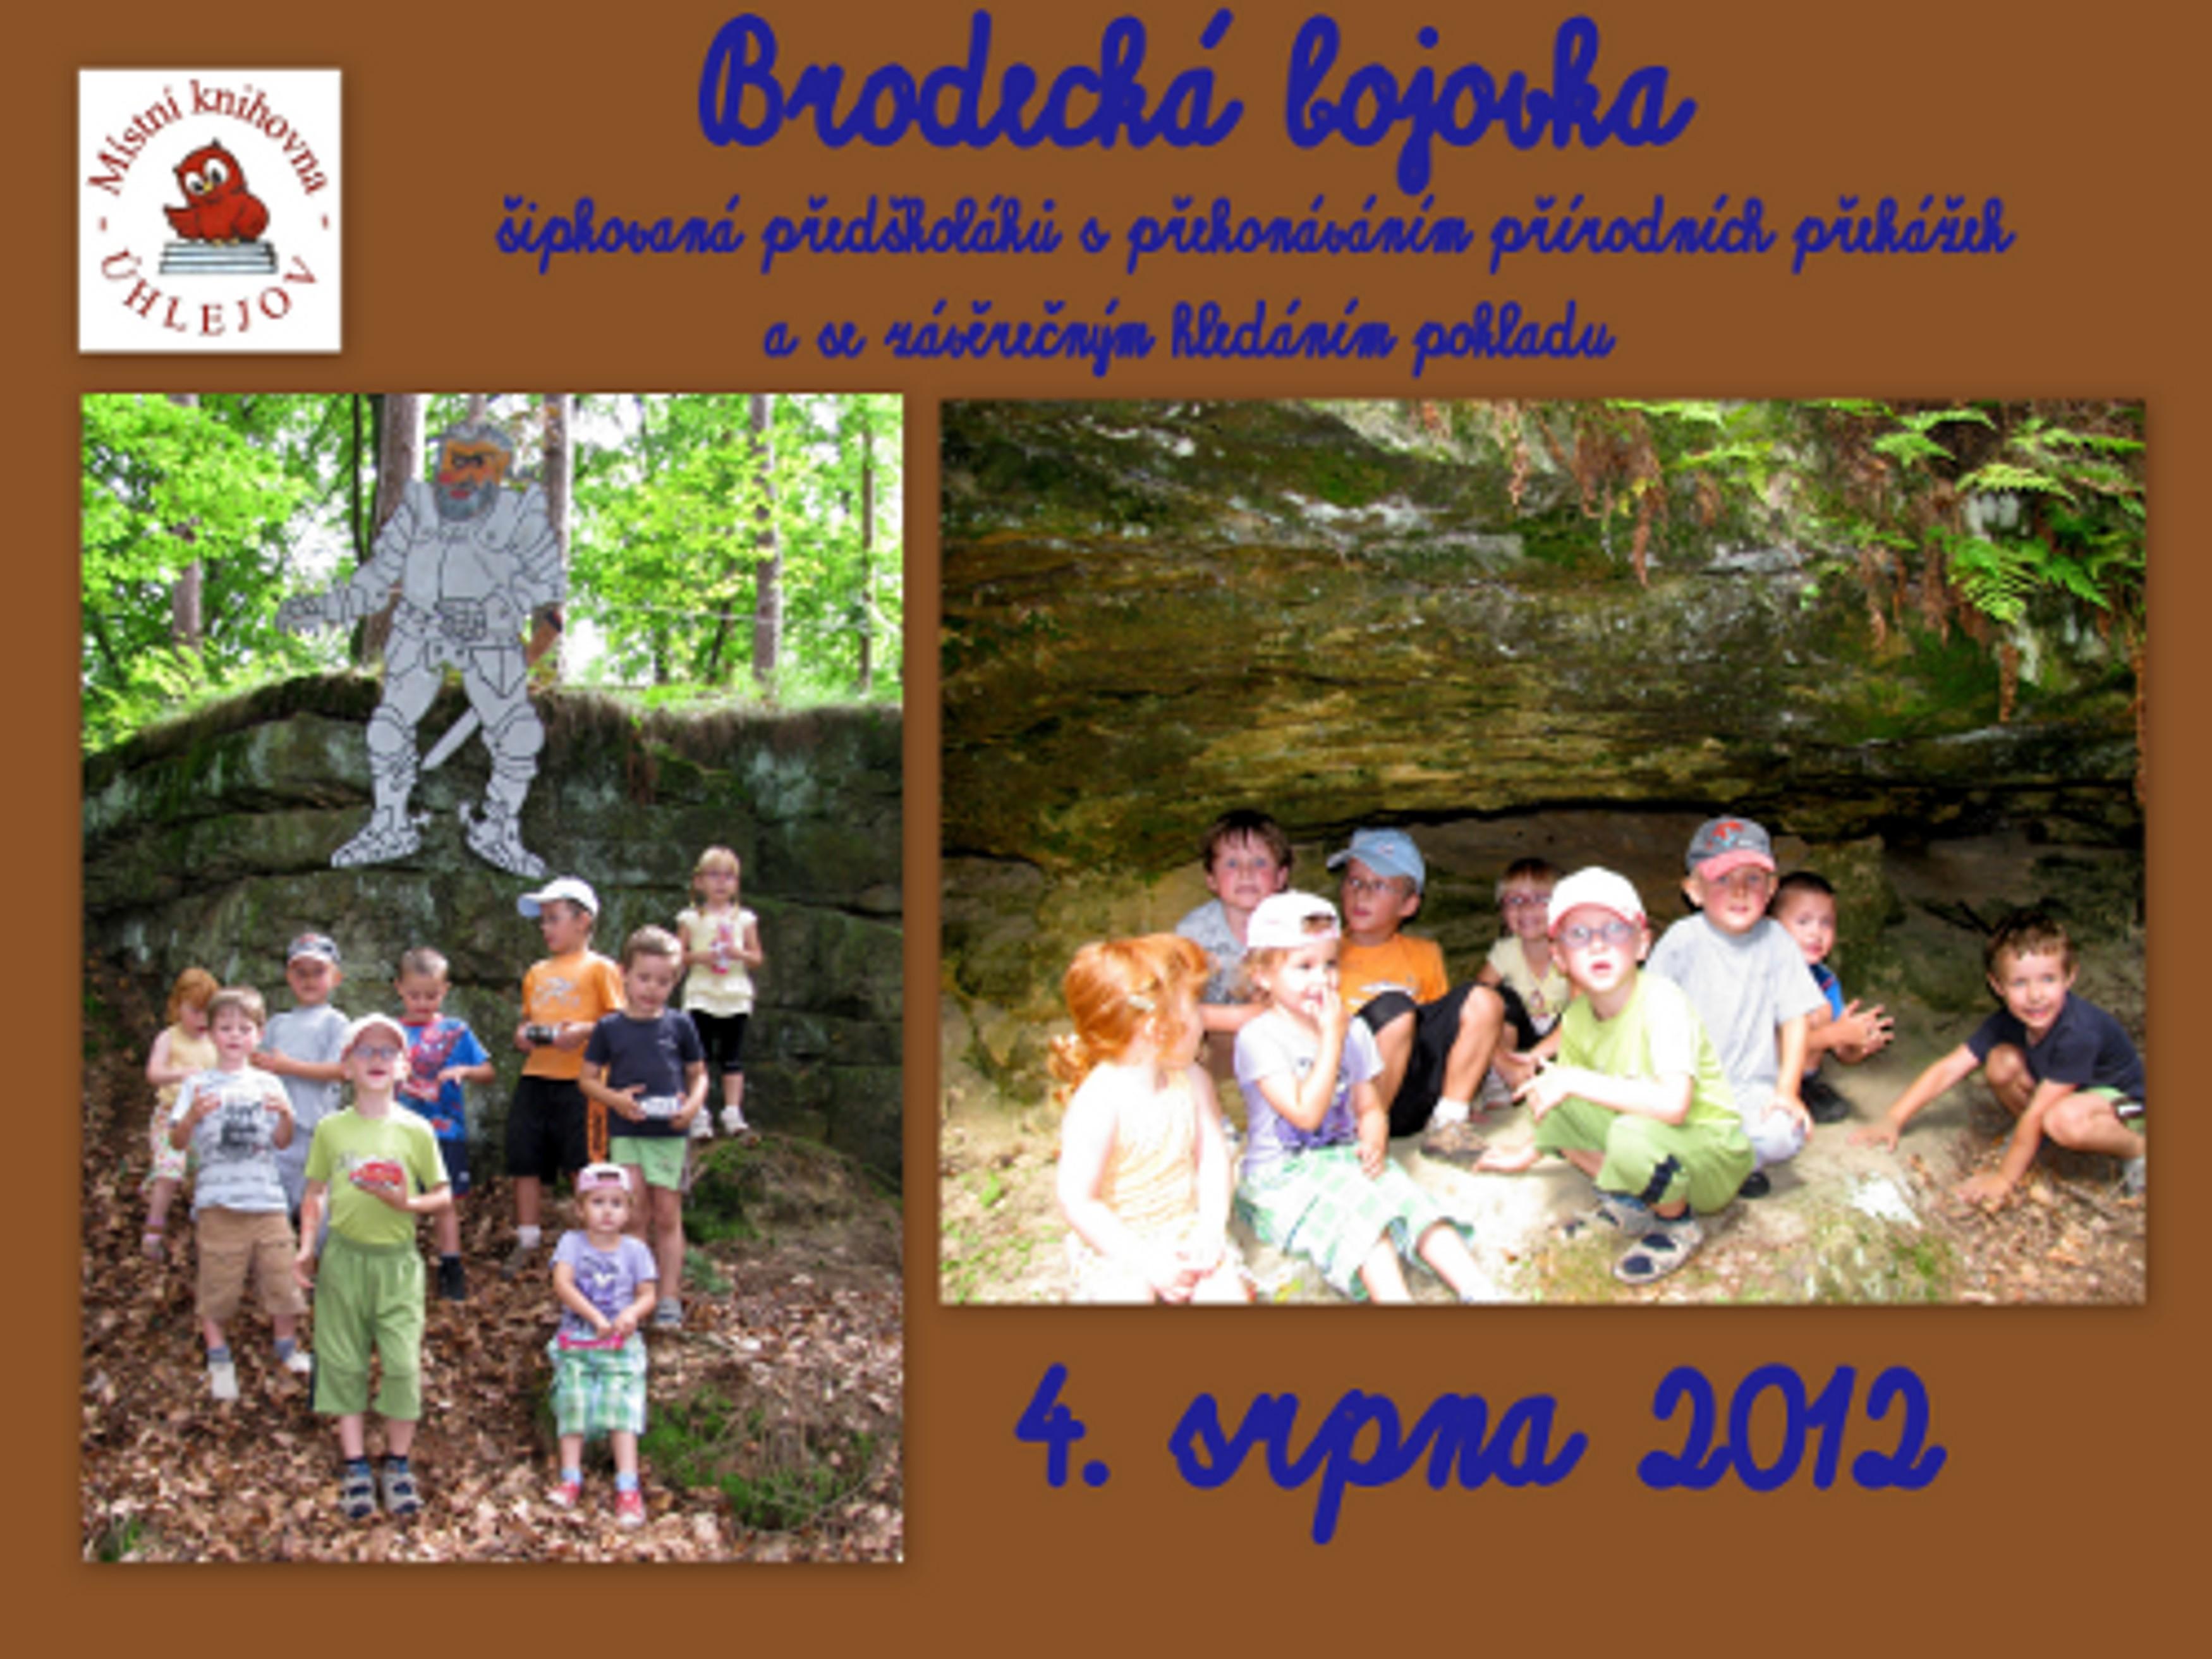 OBRÁZEK : brodecka_bojovka_-_zmens._kolaz_srpen_20121_.jpg